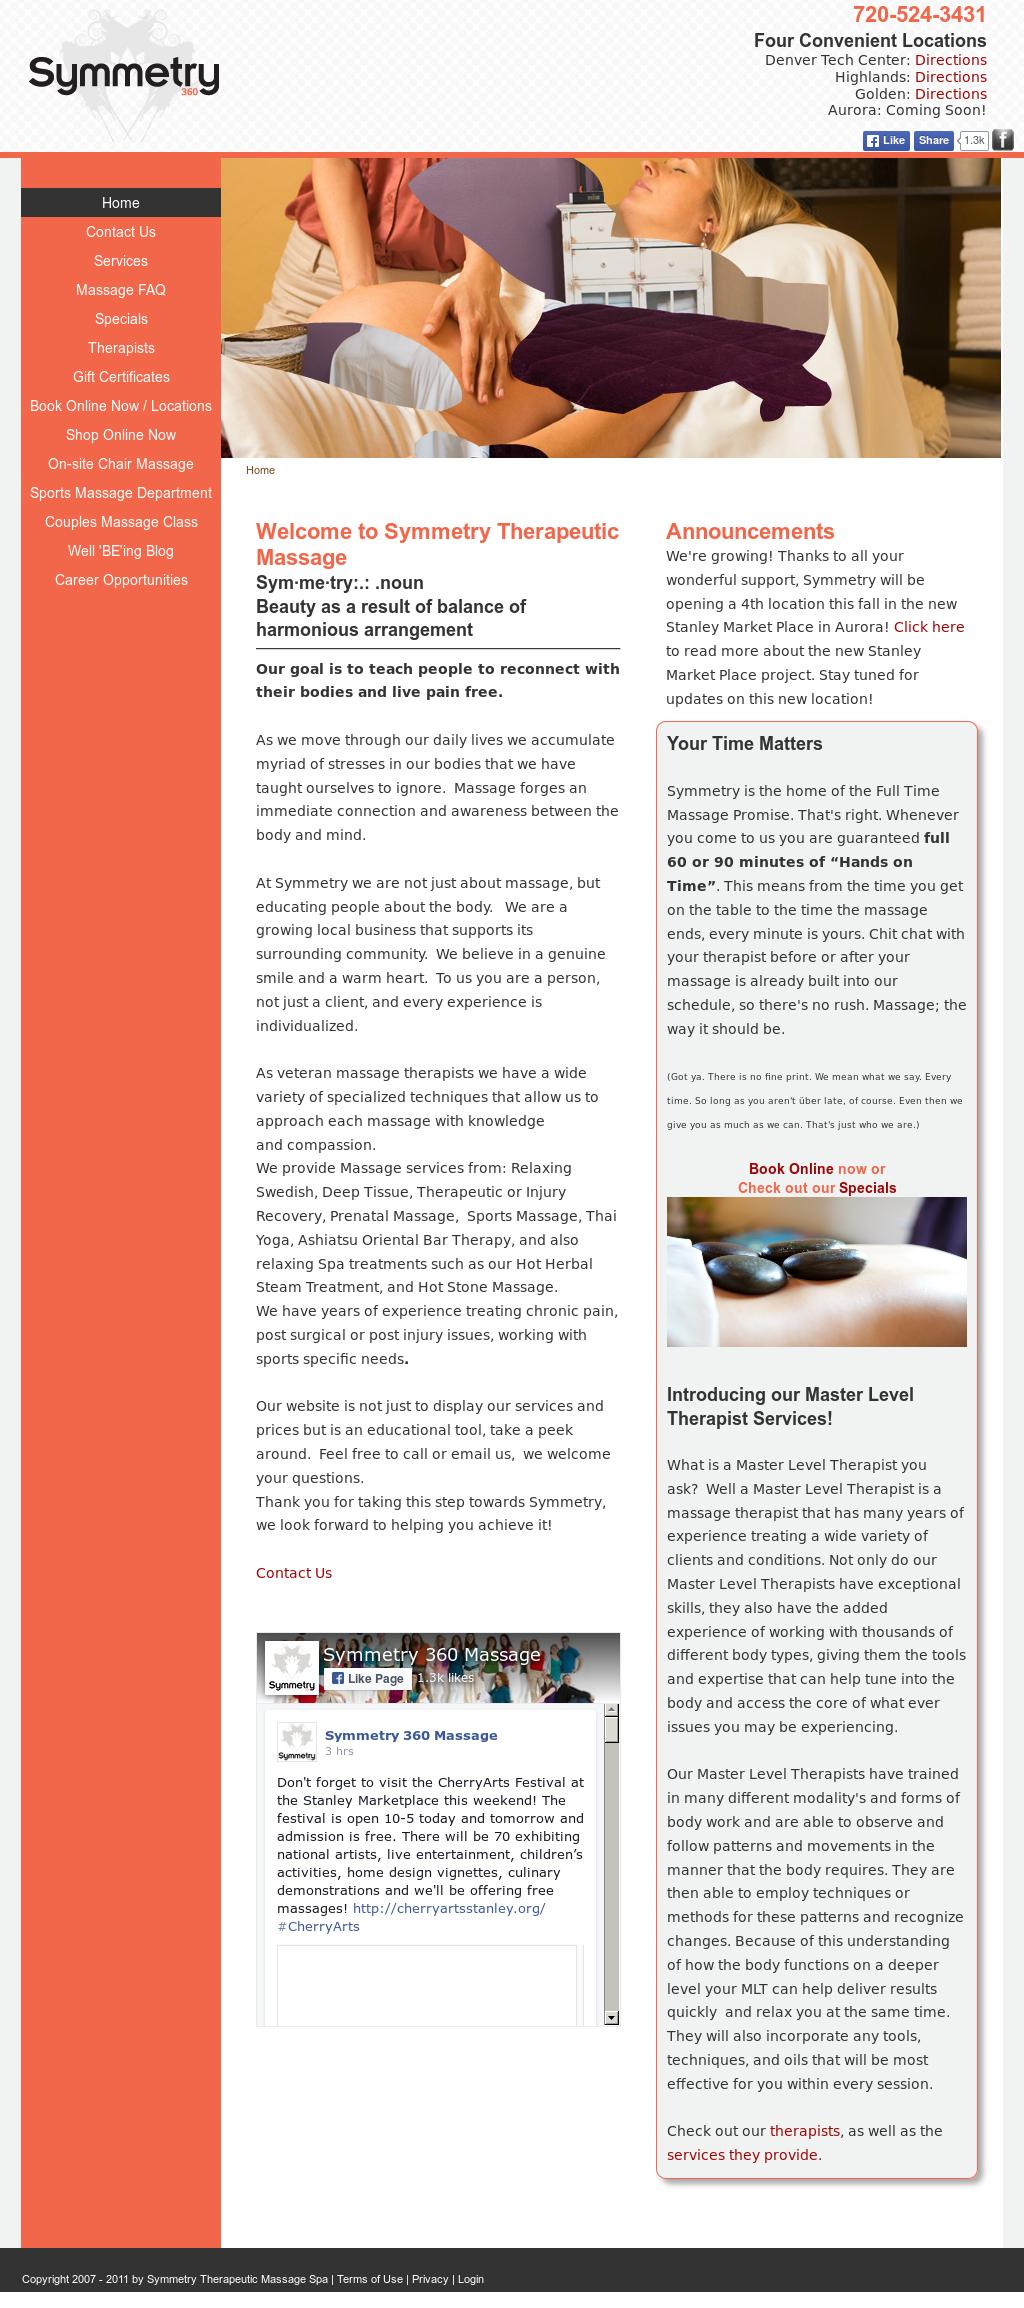 Symmetry Therapeutic Massage Competitors, Revenue and